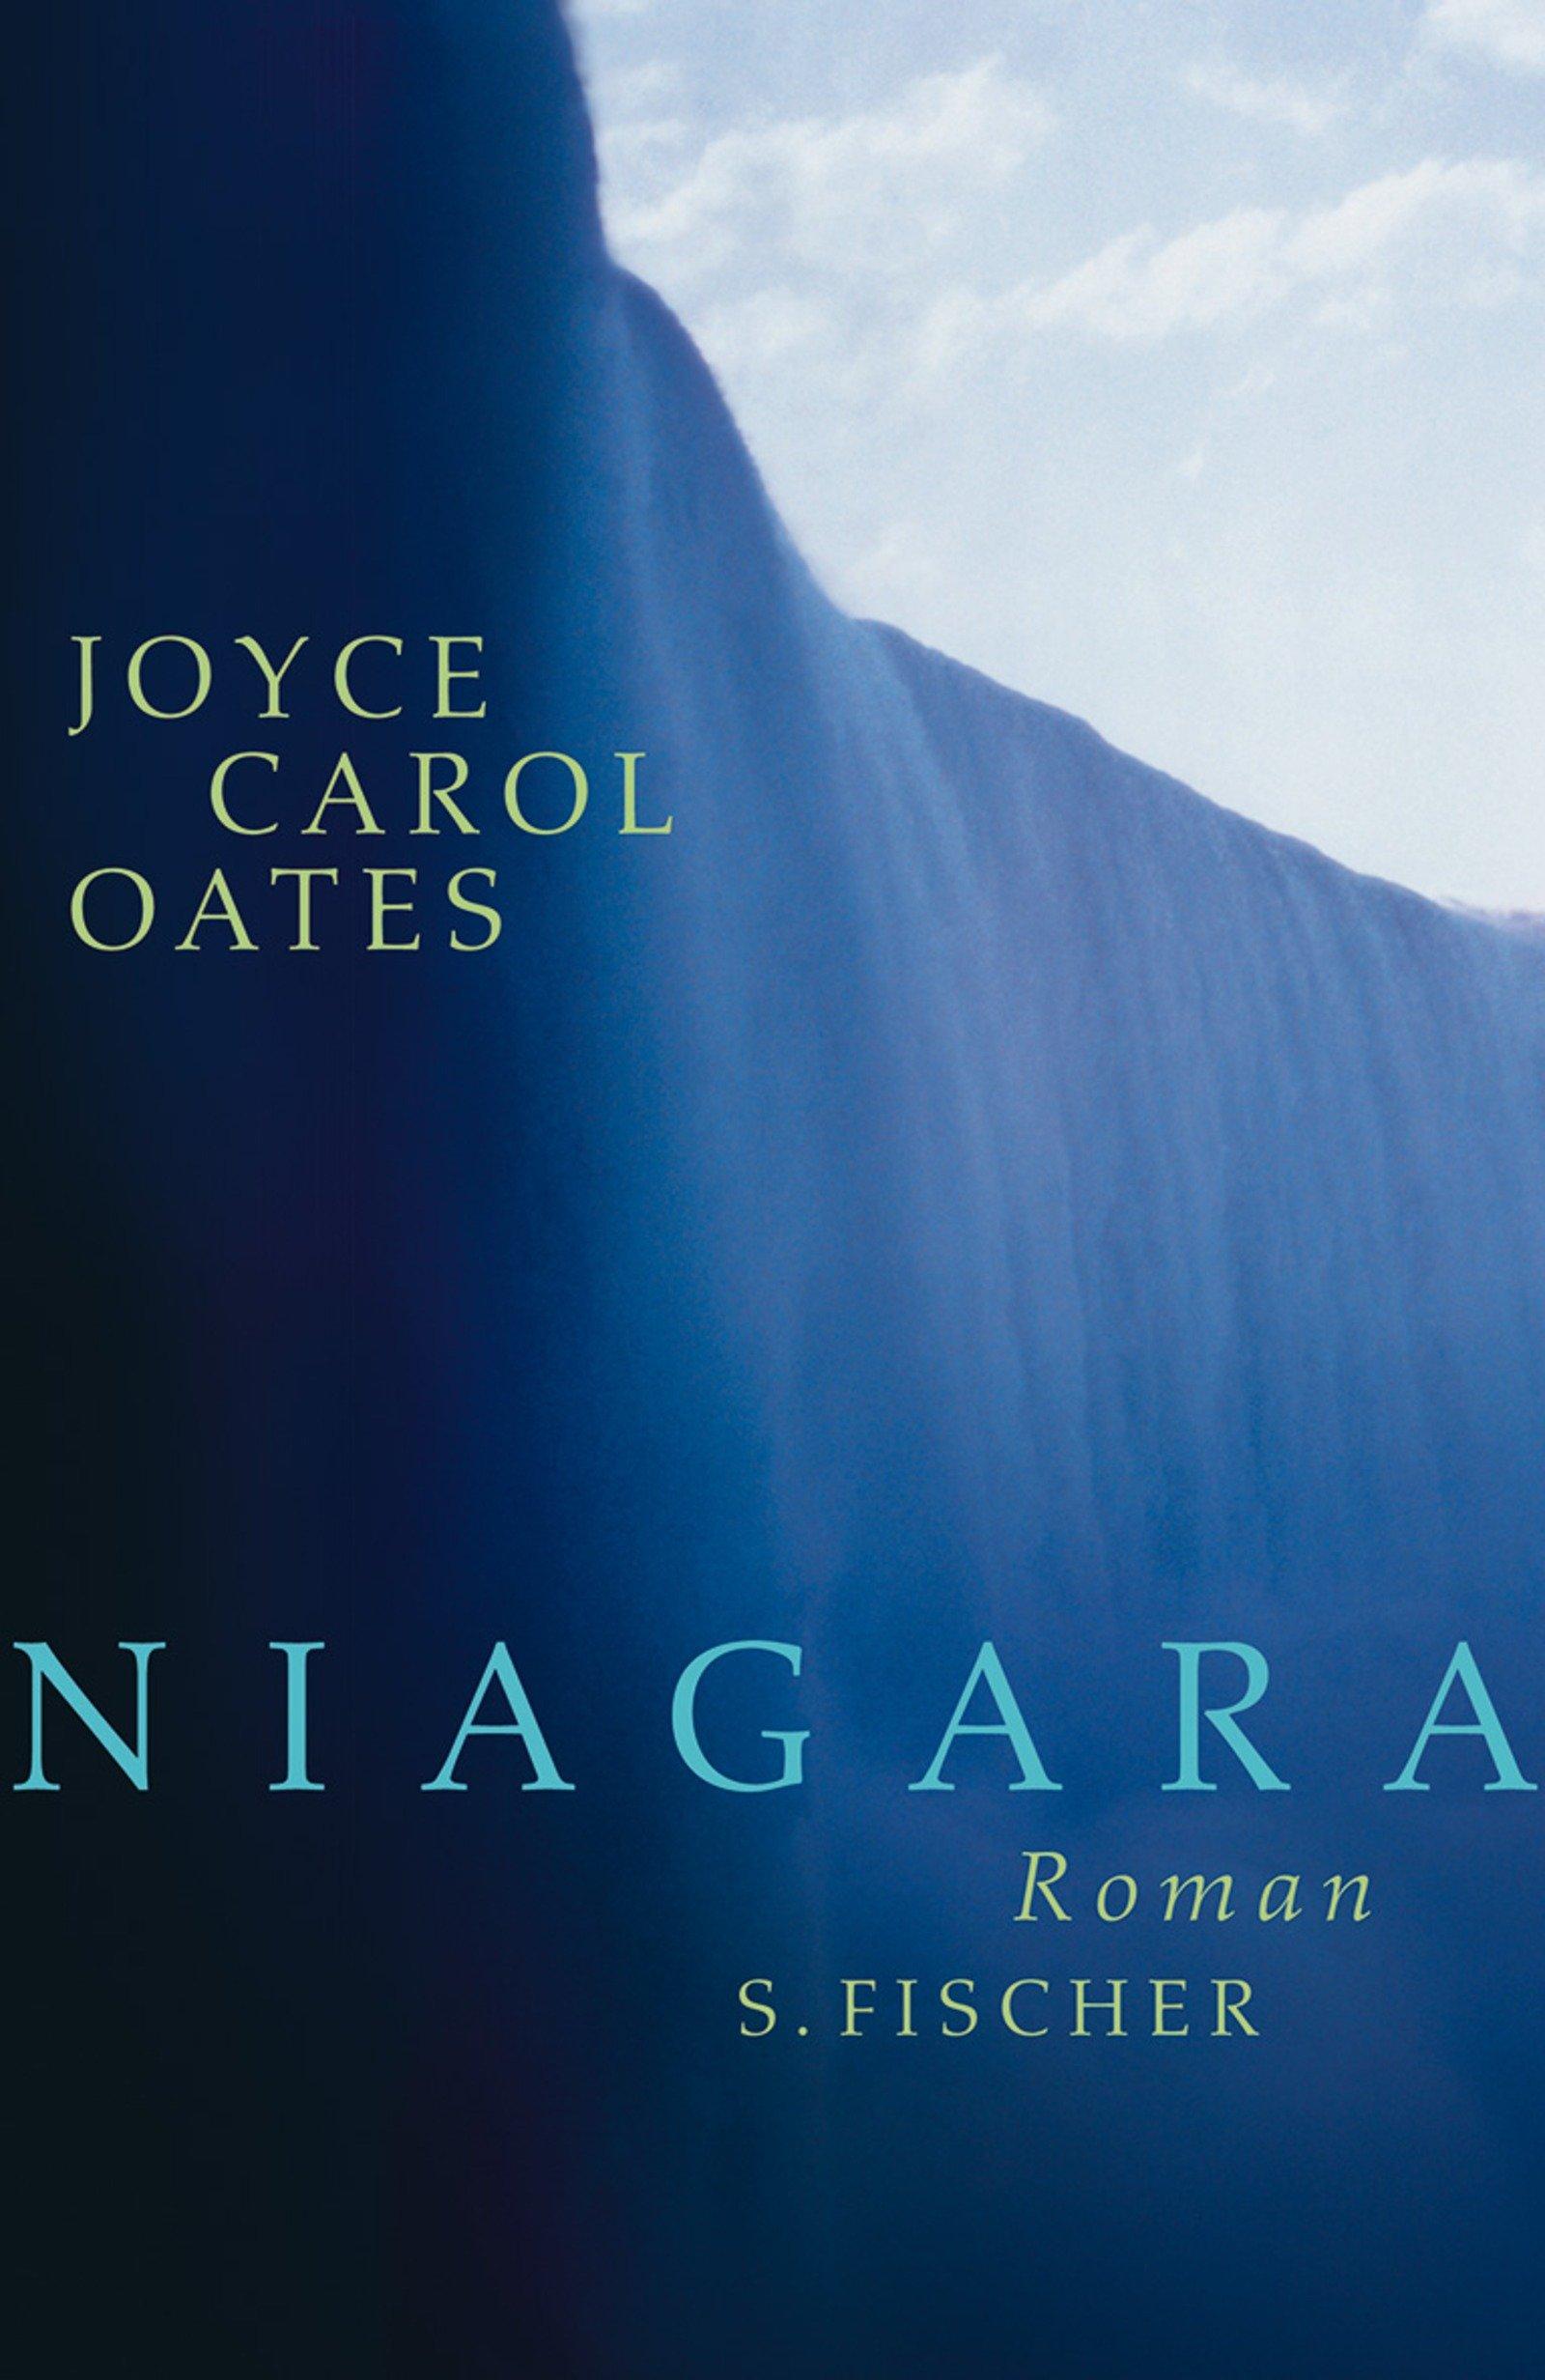 Niagara: Roman: Amazon.de: Joyce Carol Oates, Silvia Morawetz: Bücher